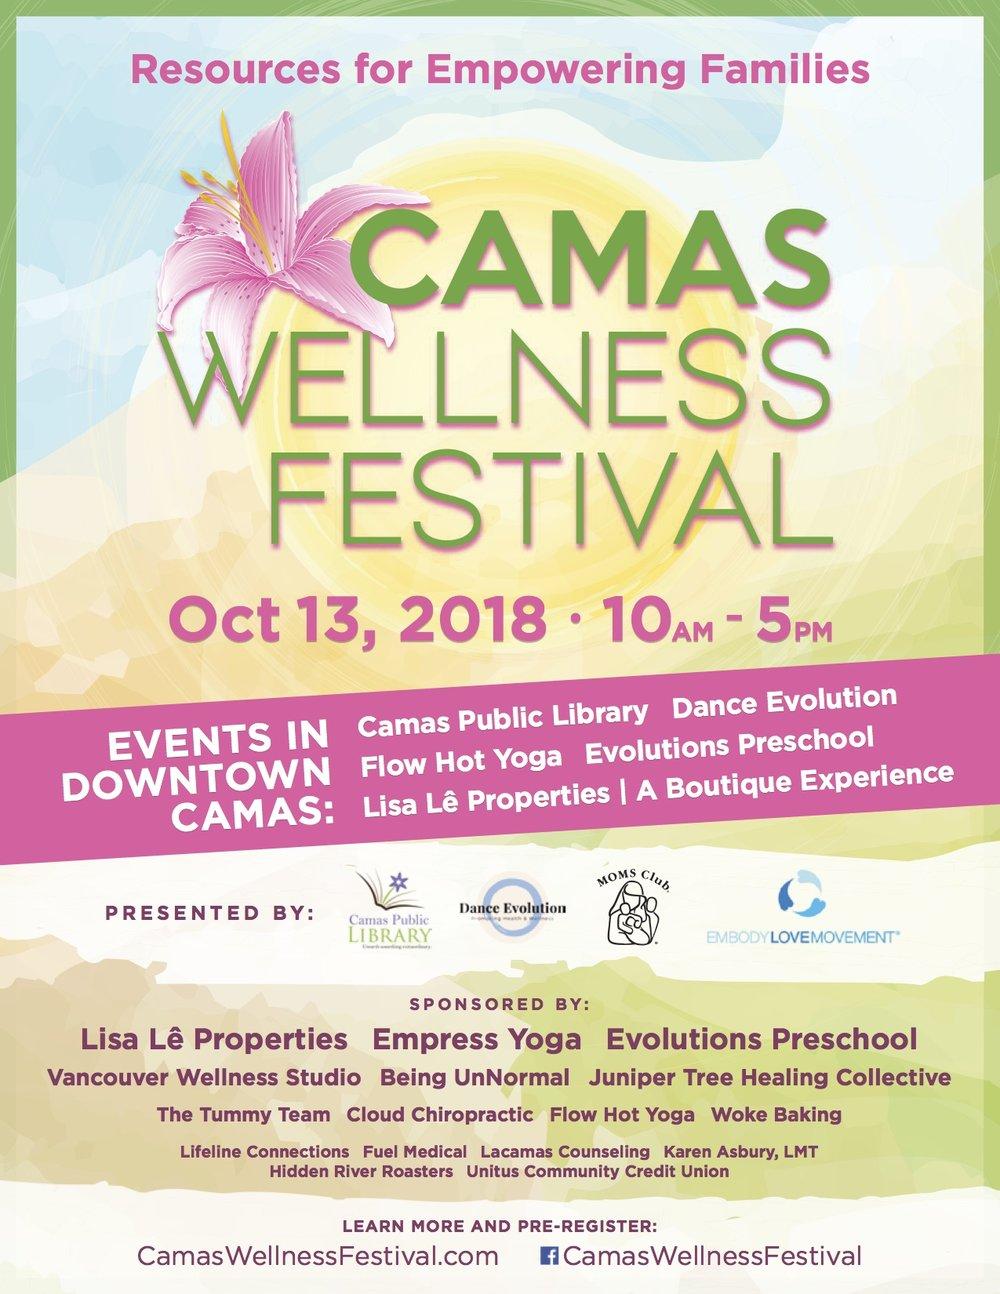 Camas Wellness Festival Flyer.jpeg